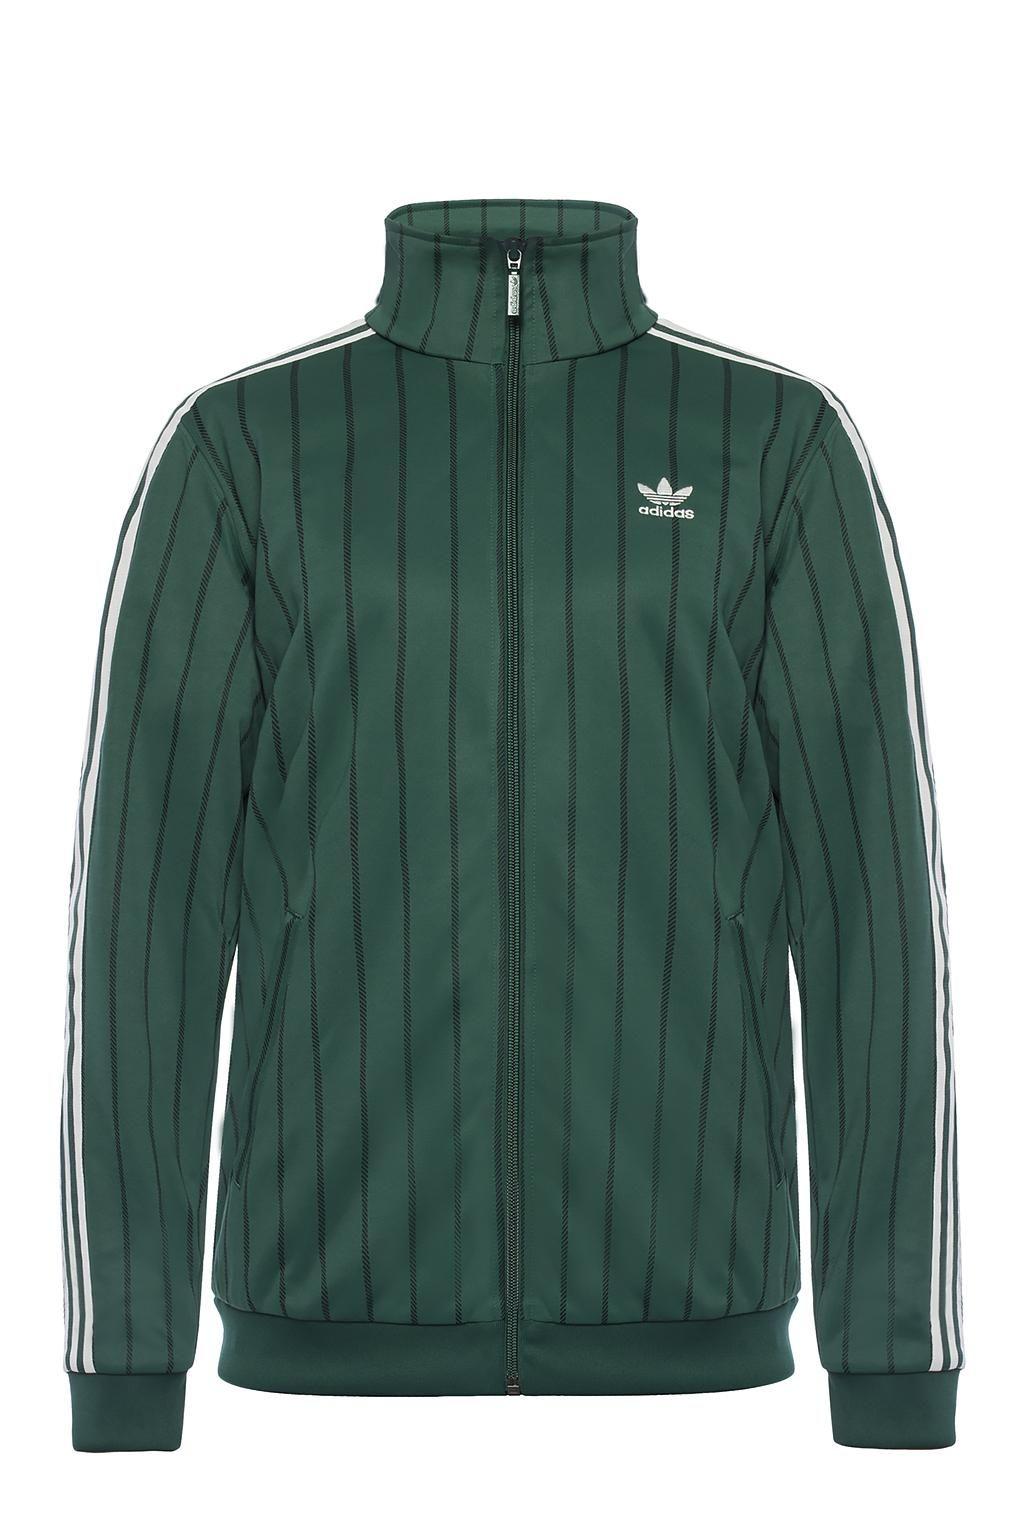 Jacket with logo ADIDAS Originals Vitkac shop online